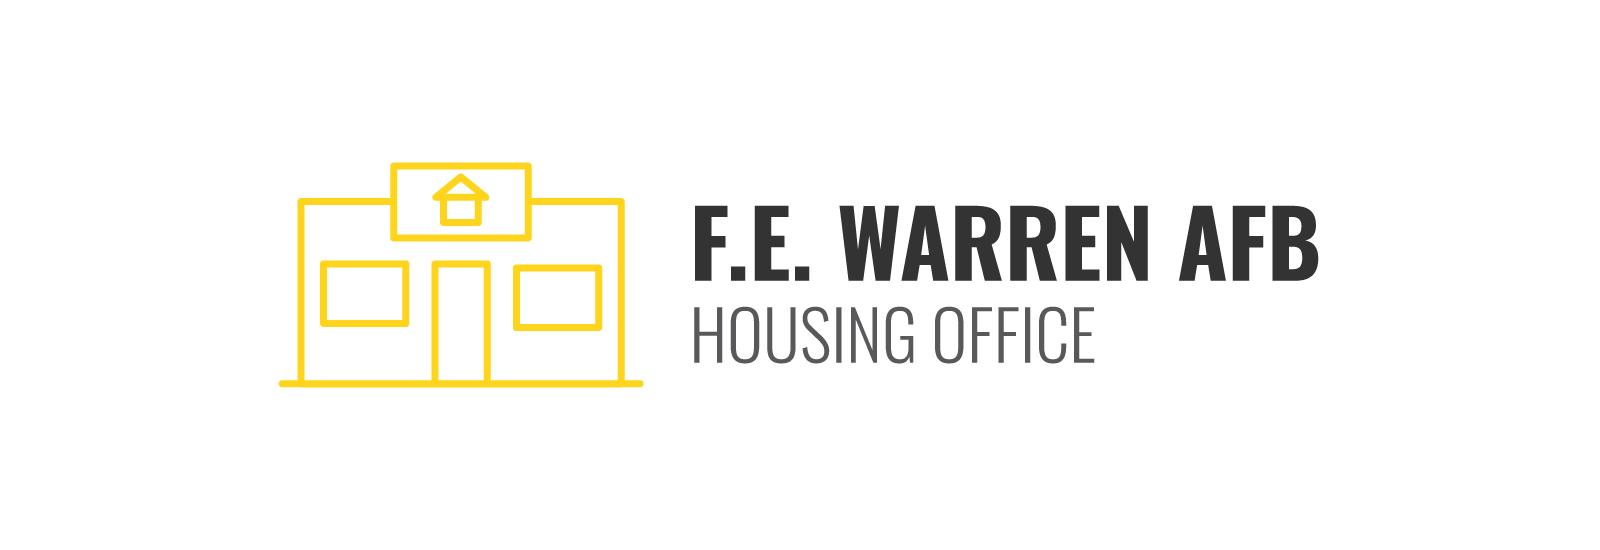 F.E. Warren AFB Housing Office